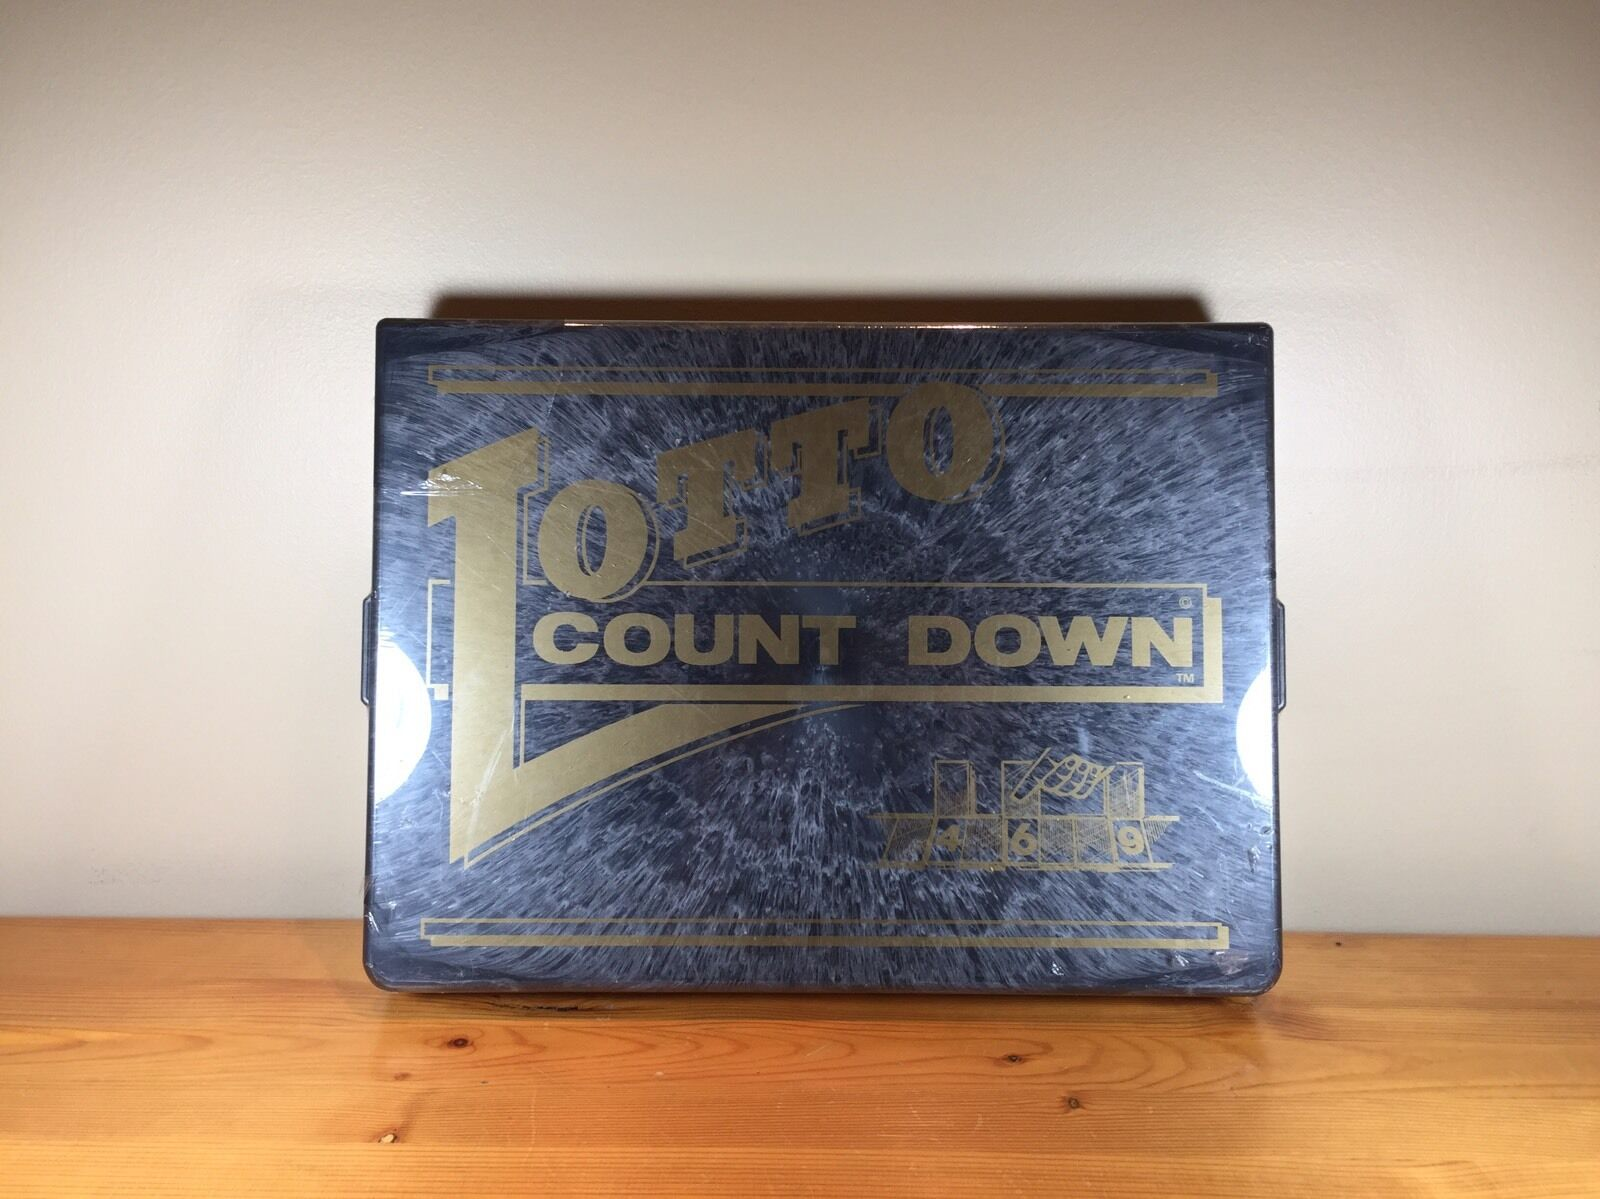 Lotto Count Down Board Game Vintage Rare